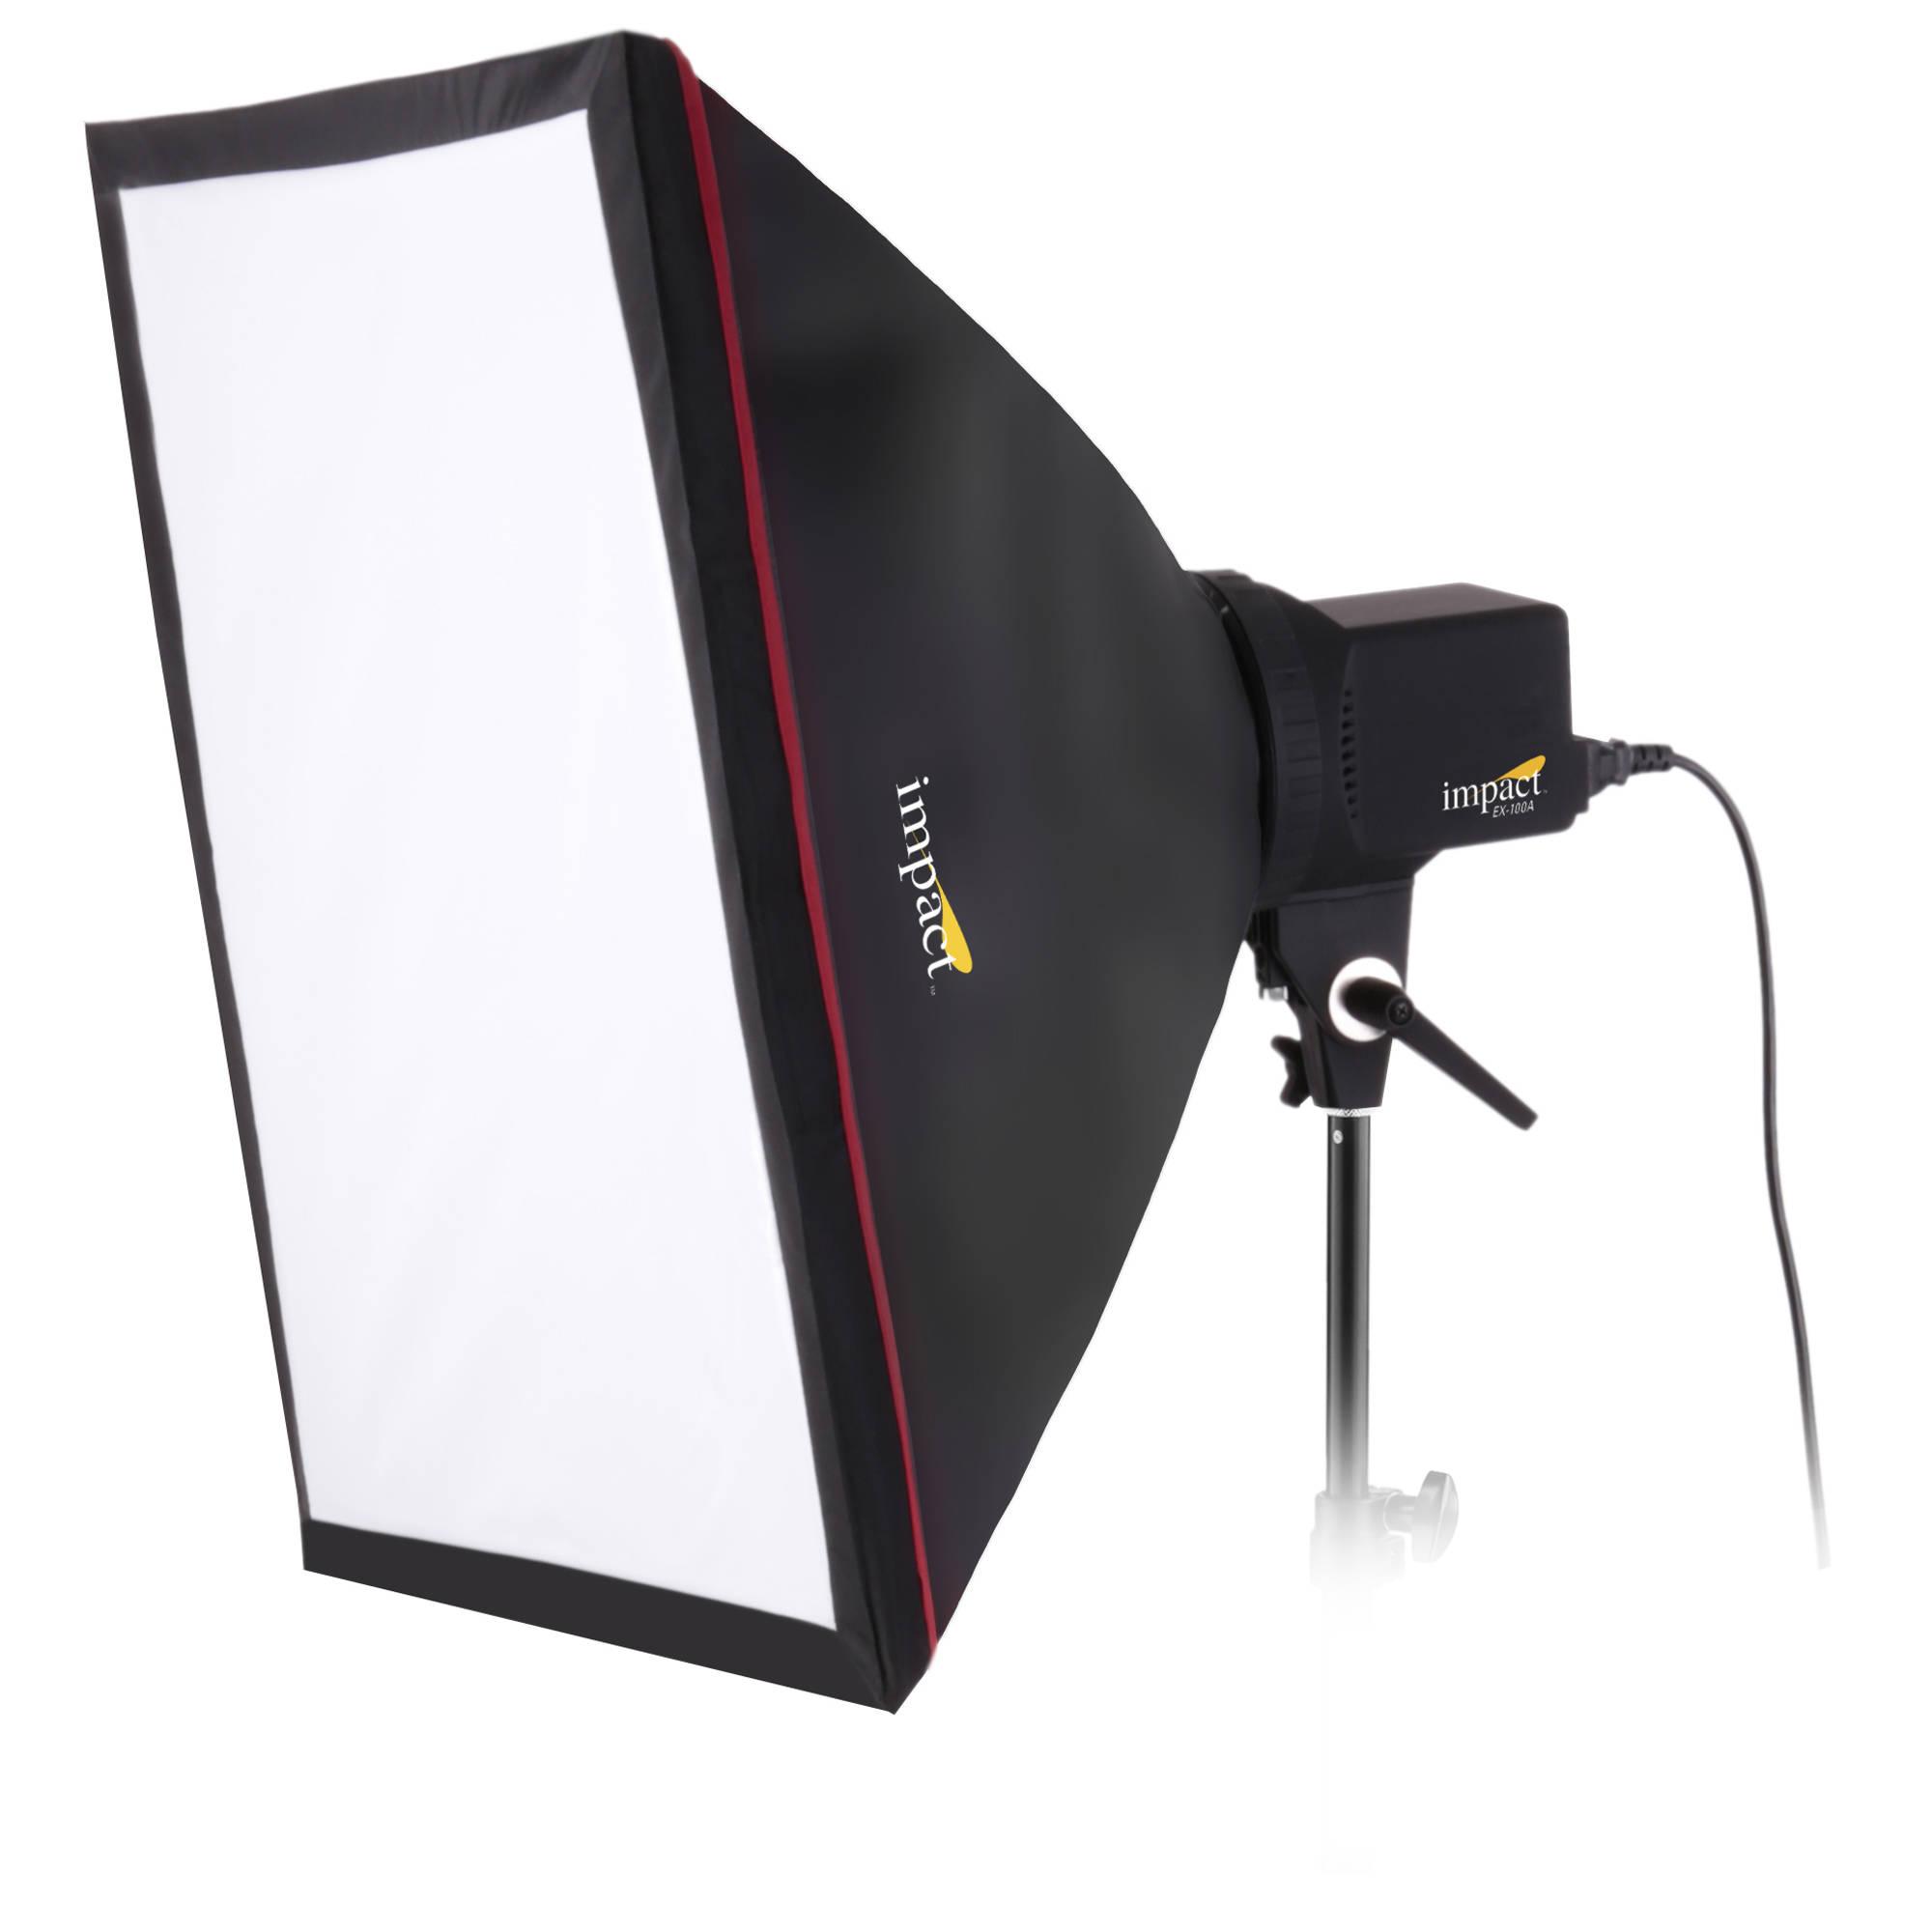 Creative Umbrella Softbox: Impact One-Monolight Kit (120 VAC) EX100A-KI B&H Photo Video